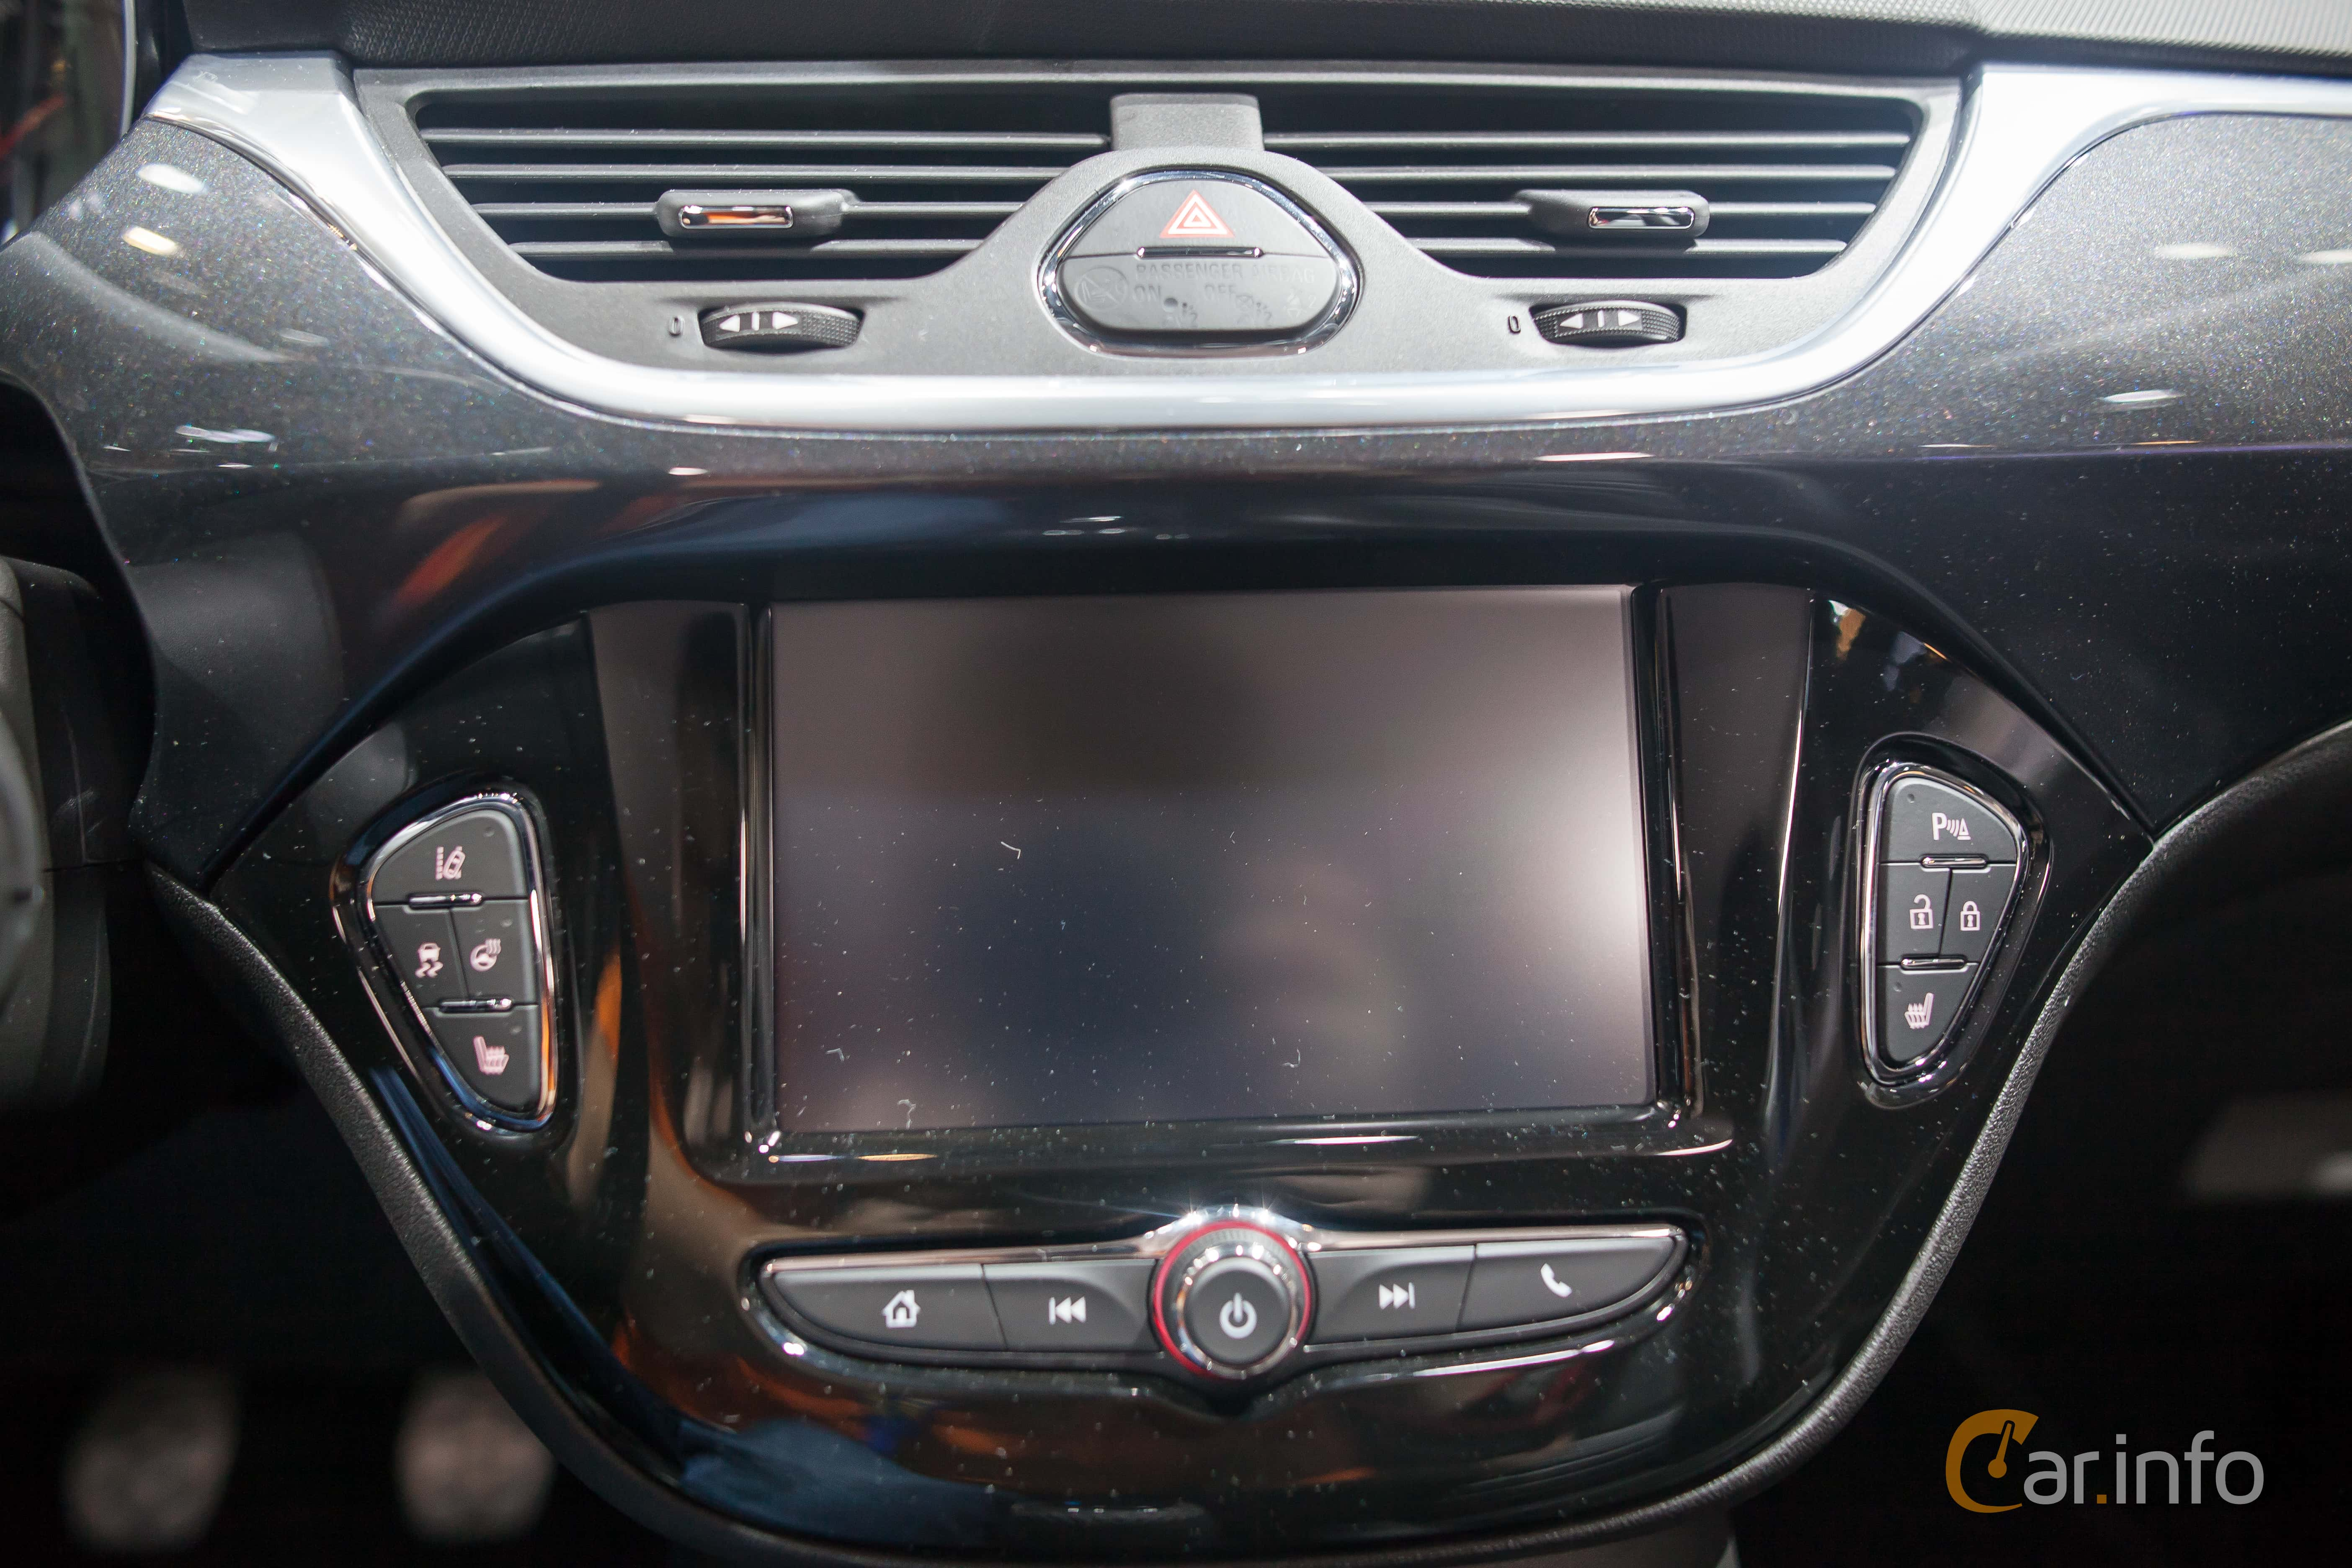 100 opel zafira interior vauxhall corsa b interior for Interior opel astra 2017